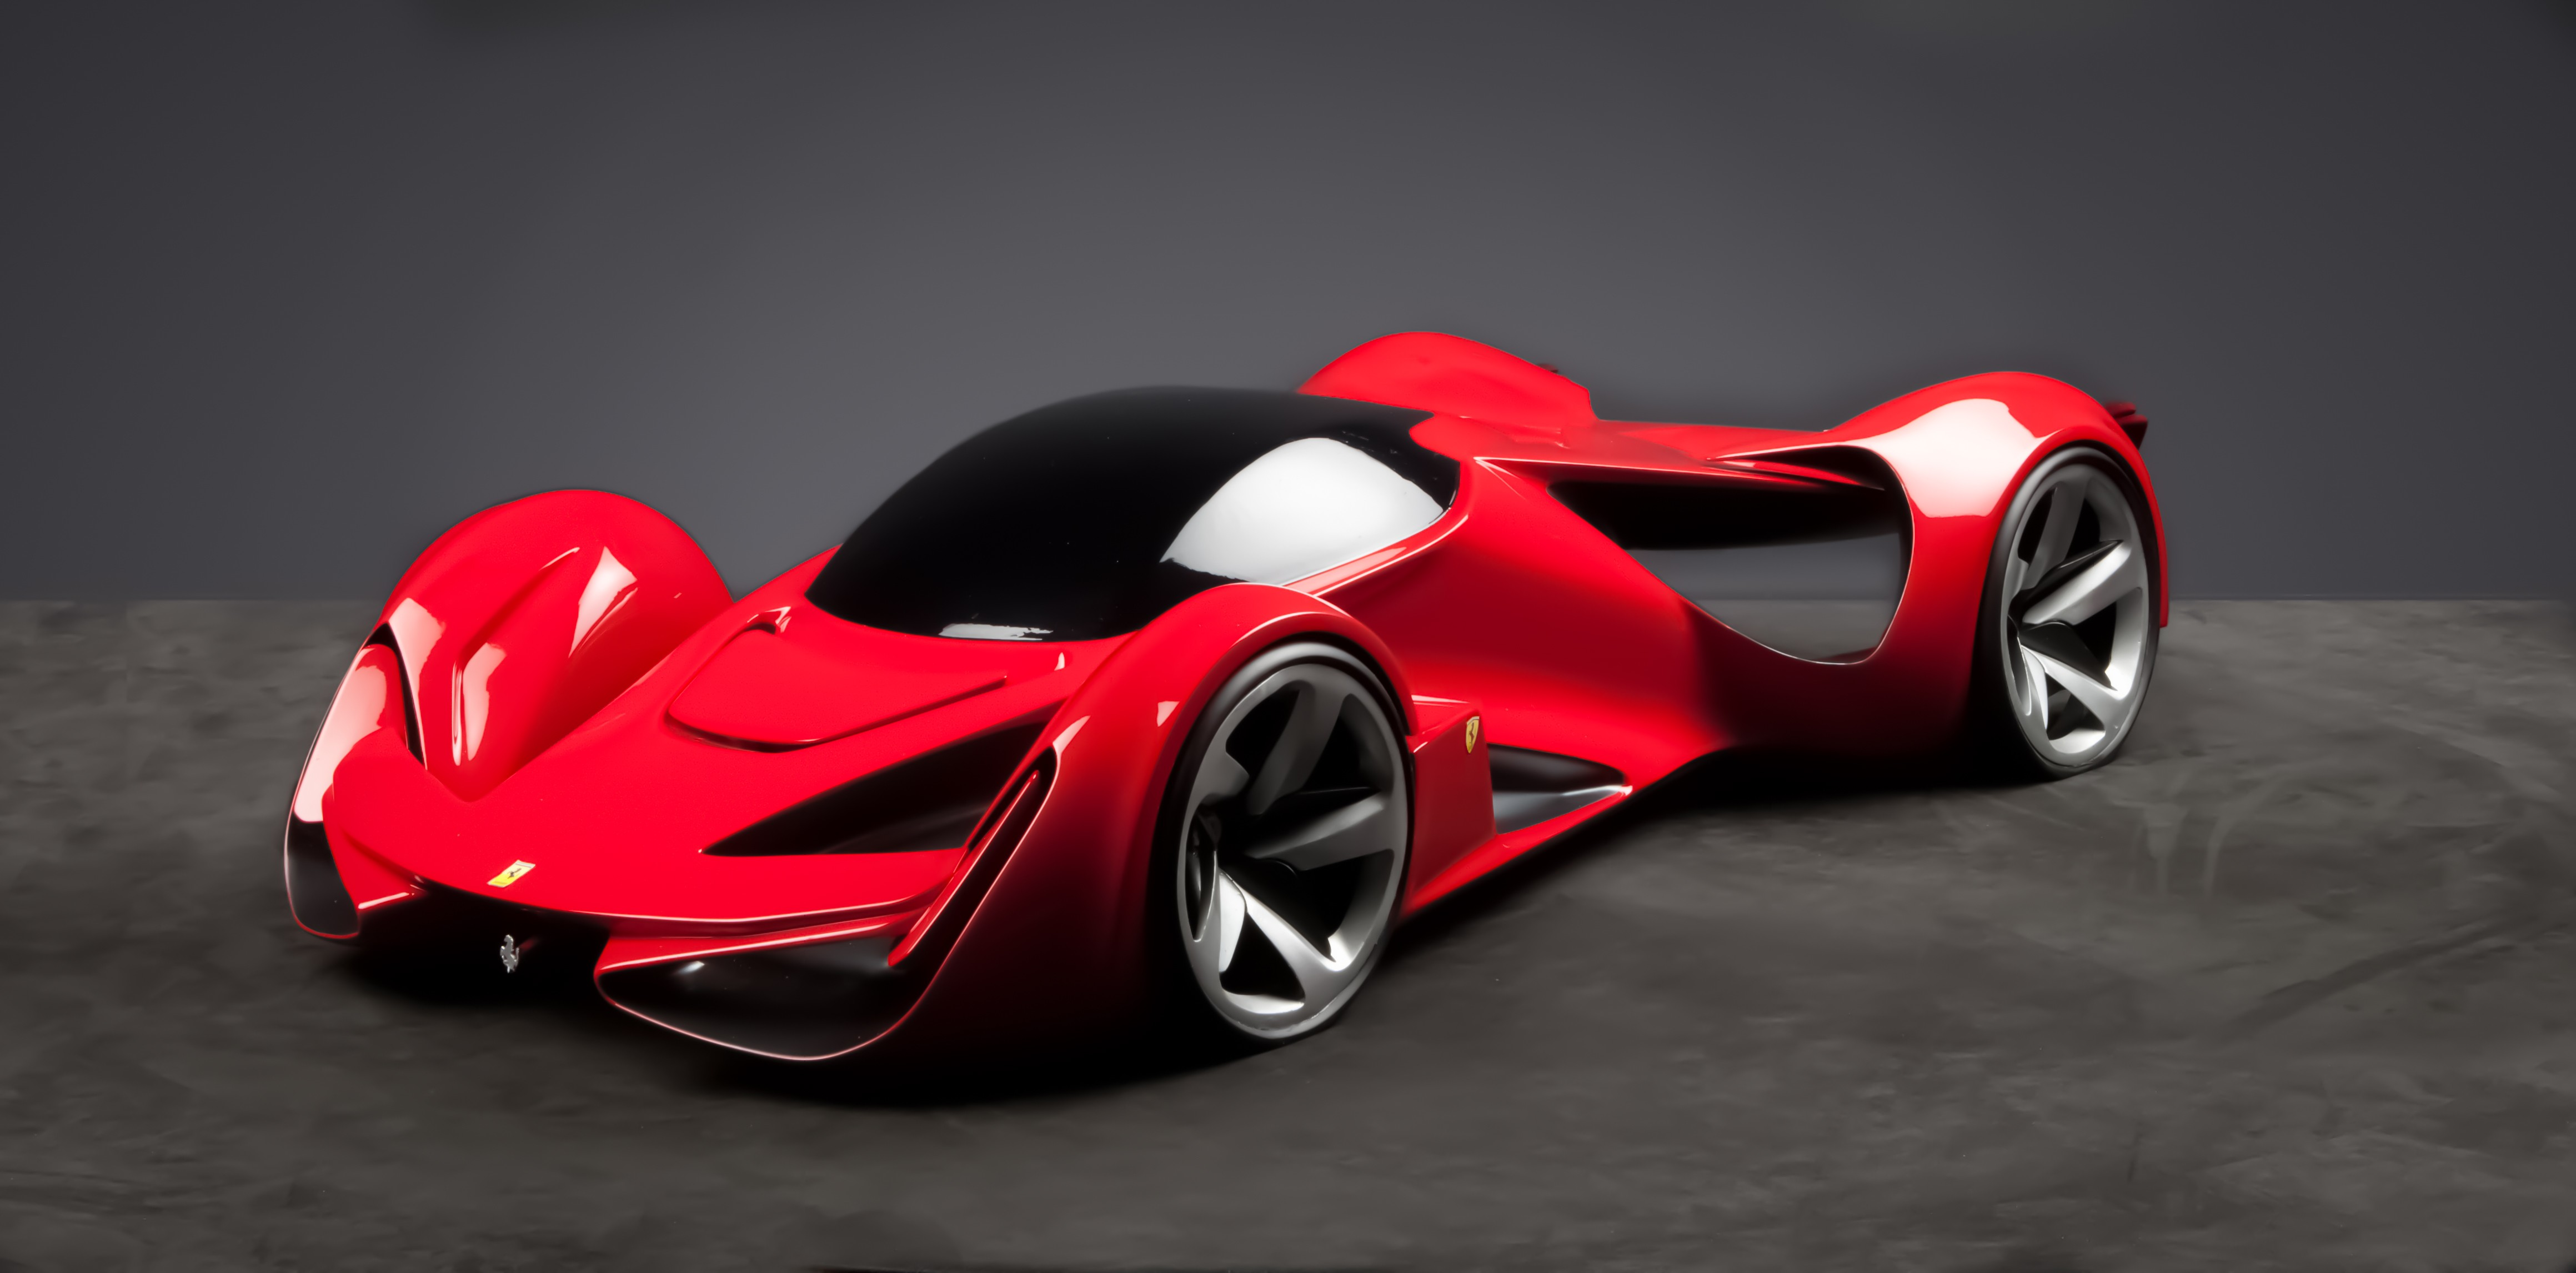 Design car contest - Your Resolution 1024x1024